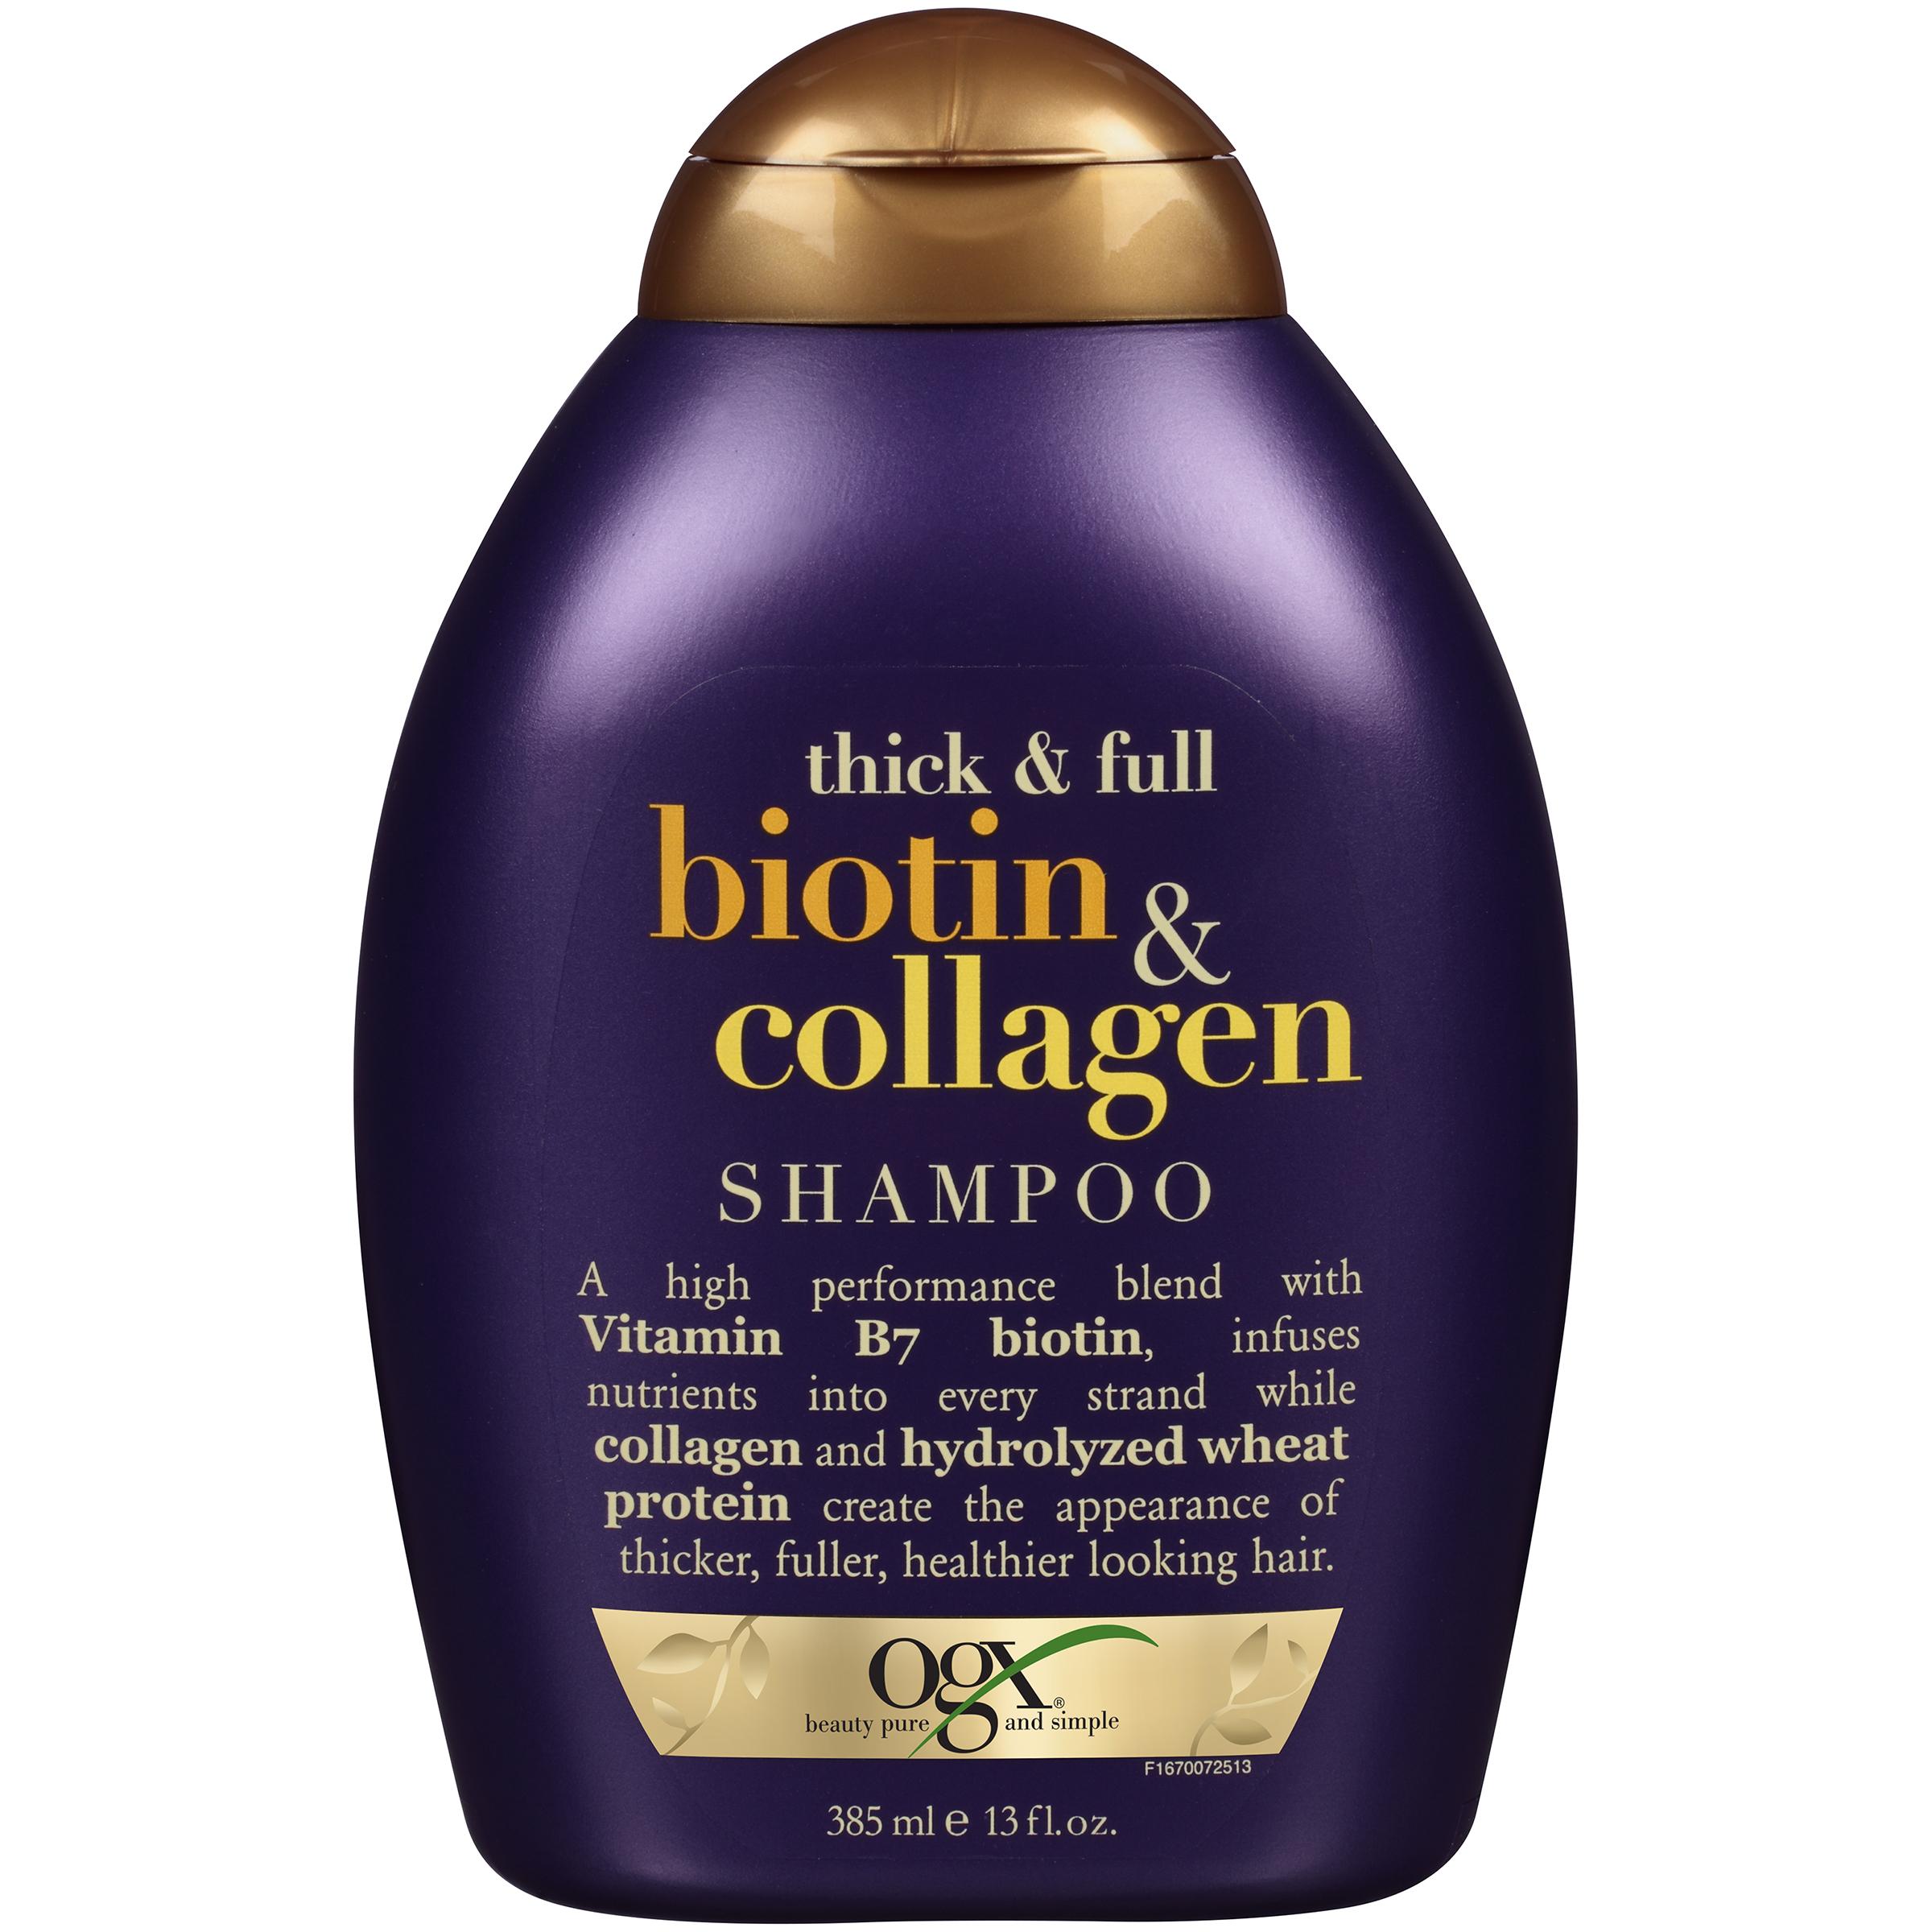 Shampoos Hair Care